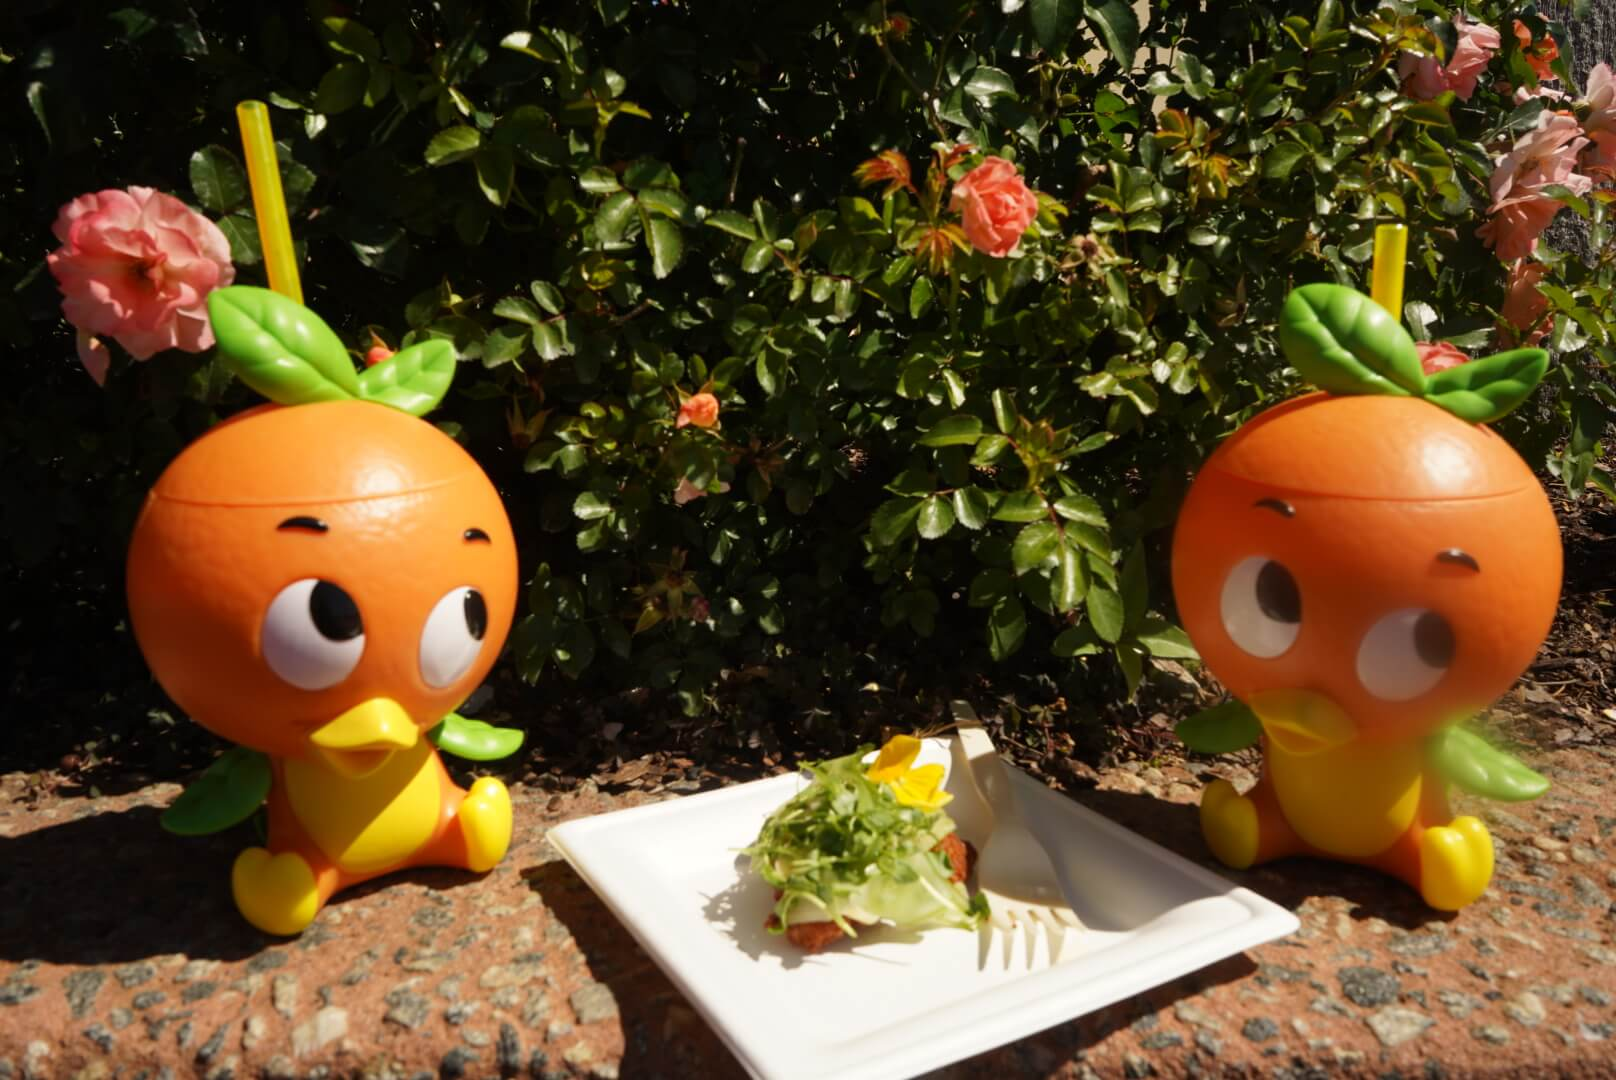 Orange Bird Sipper and Orange Crispy Citrus Chicken Aioli at Epcot Flower and Garden Festival 2019